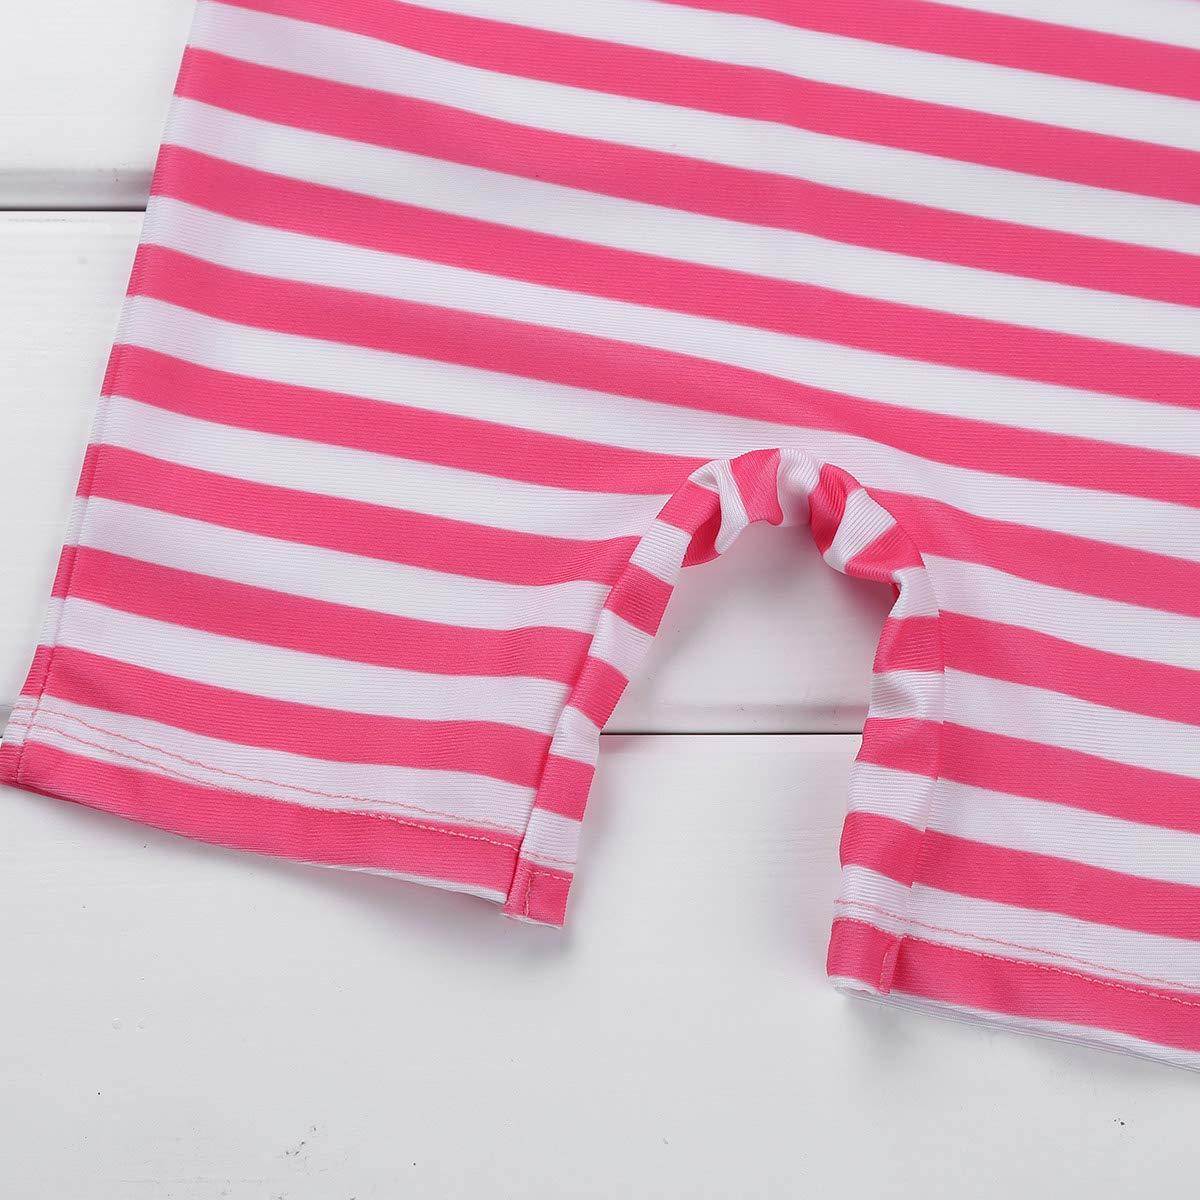 Freebily Toddler Baby Girls One Piece Zip Rash Guard Sun Protection Swimsuit Swimwear Wetsuit UPF 50+